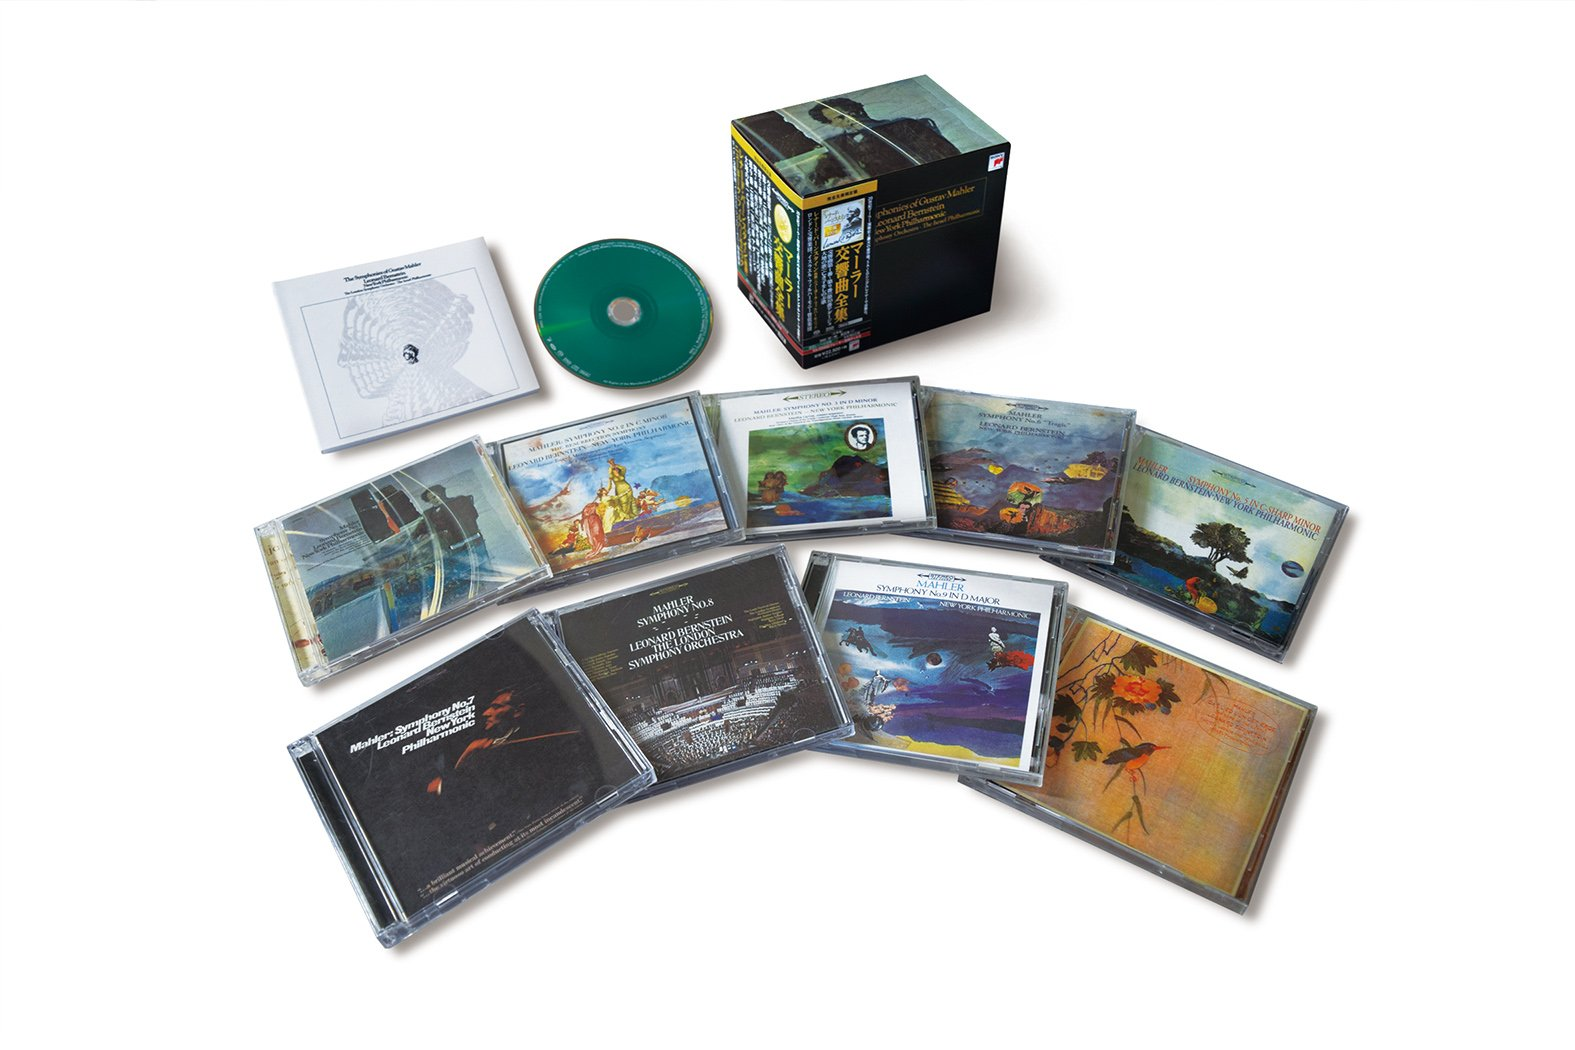 SACD : MAHLER / BERNSTEIN, LEONARD - Mahler: Complete Symphonies (Limited Edition, Boxed Set, Direct Stream Digital, Japan - Import, 9PC)